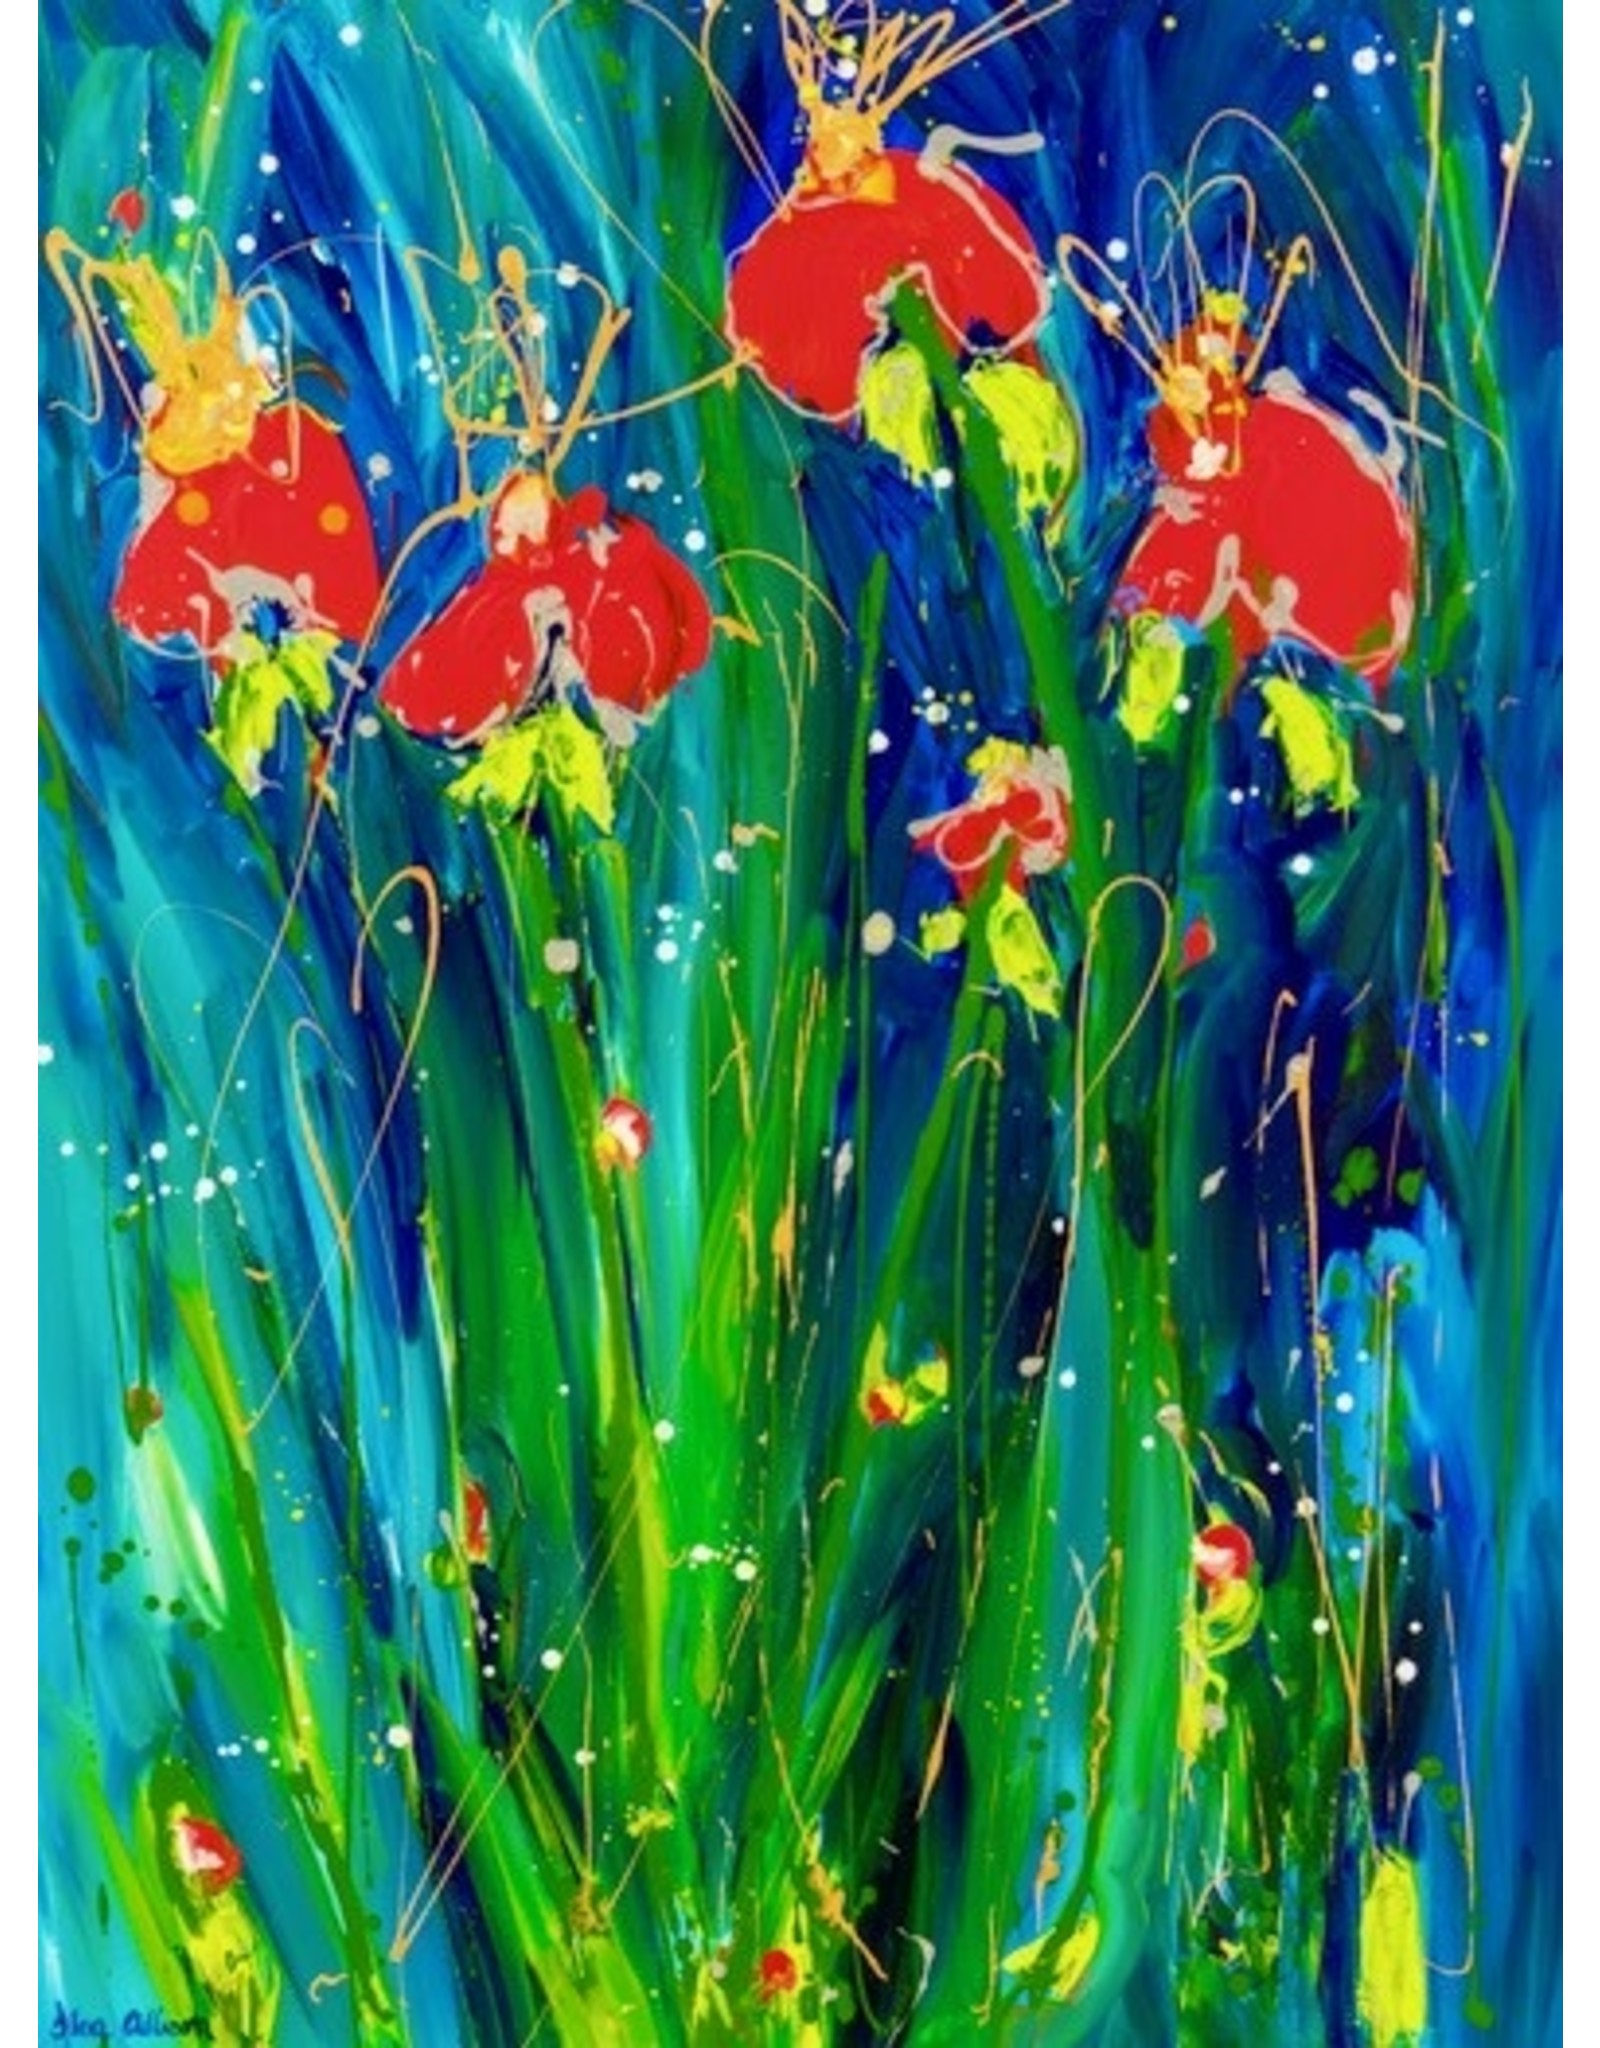 "Lisa Jill Allison SLEEPING BEAUTY, acrylic on GW canvas, 40x30"", LISA"